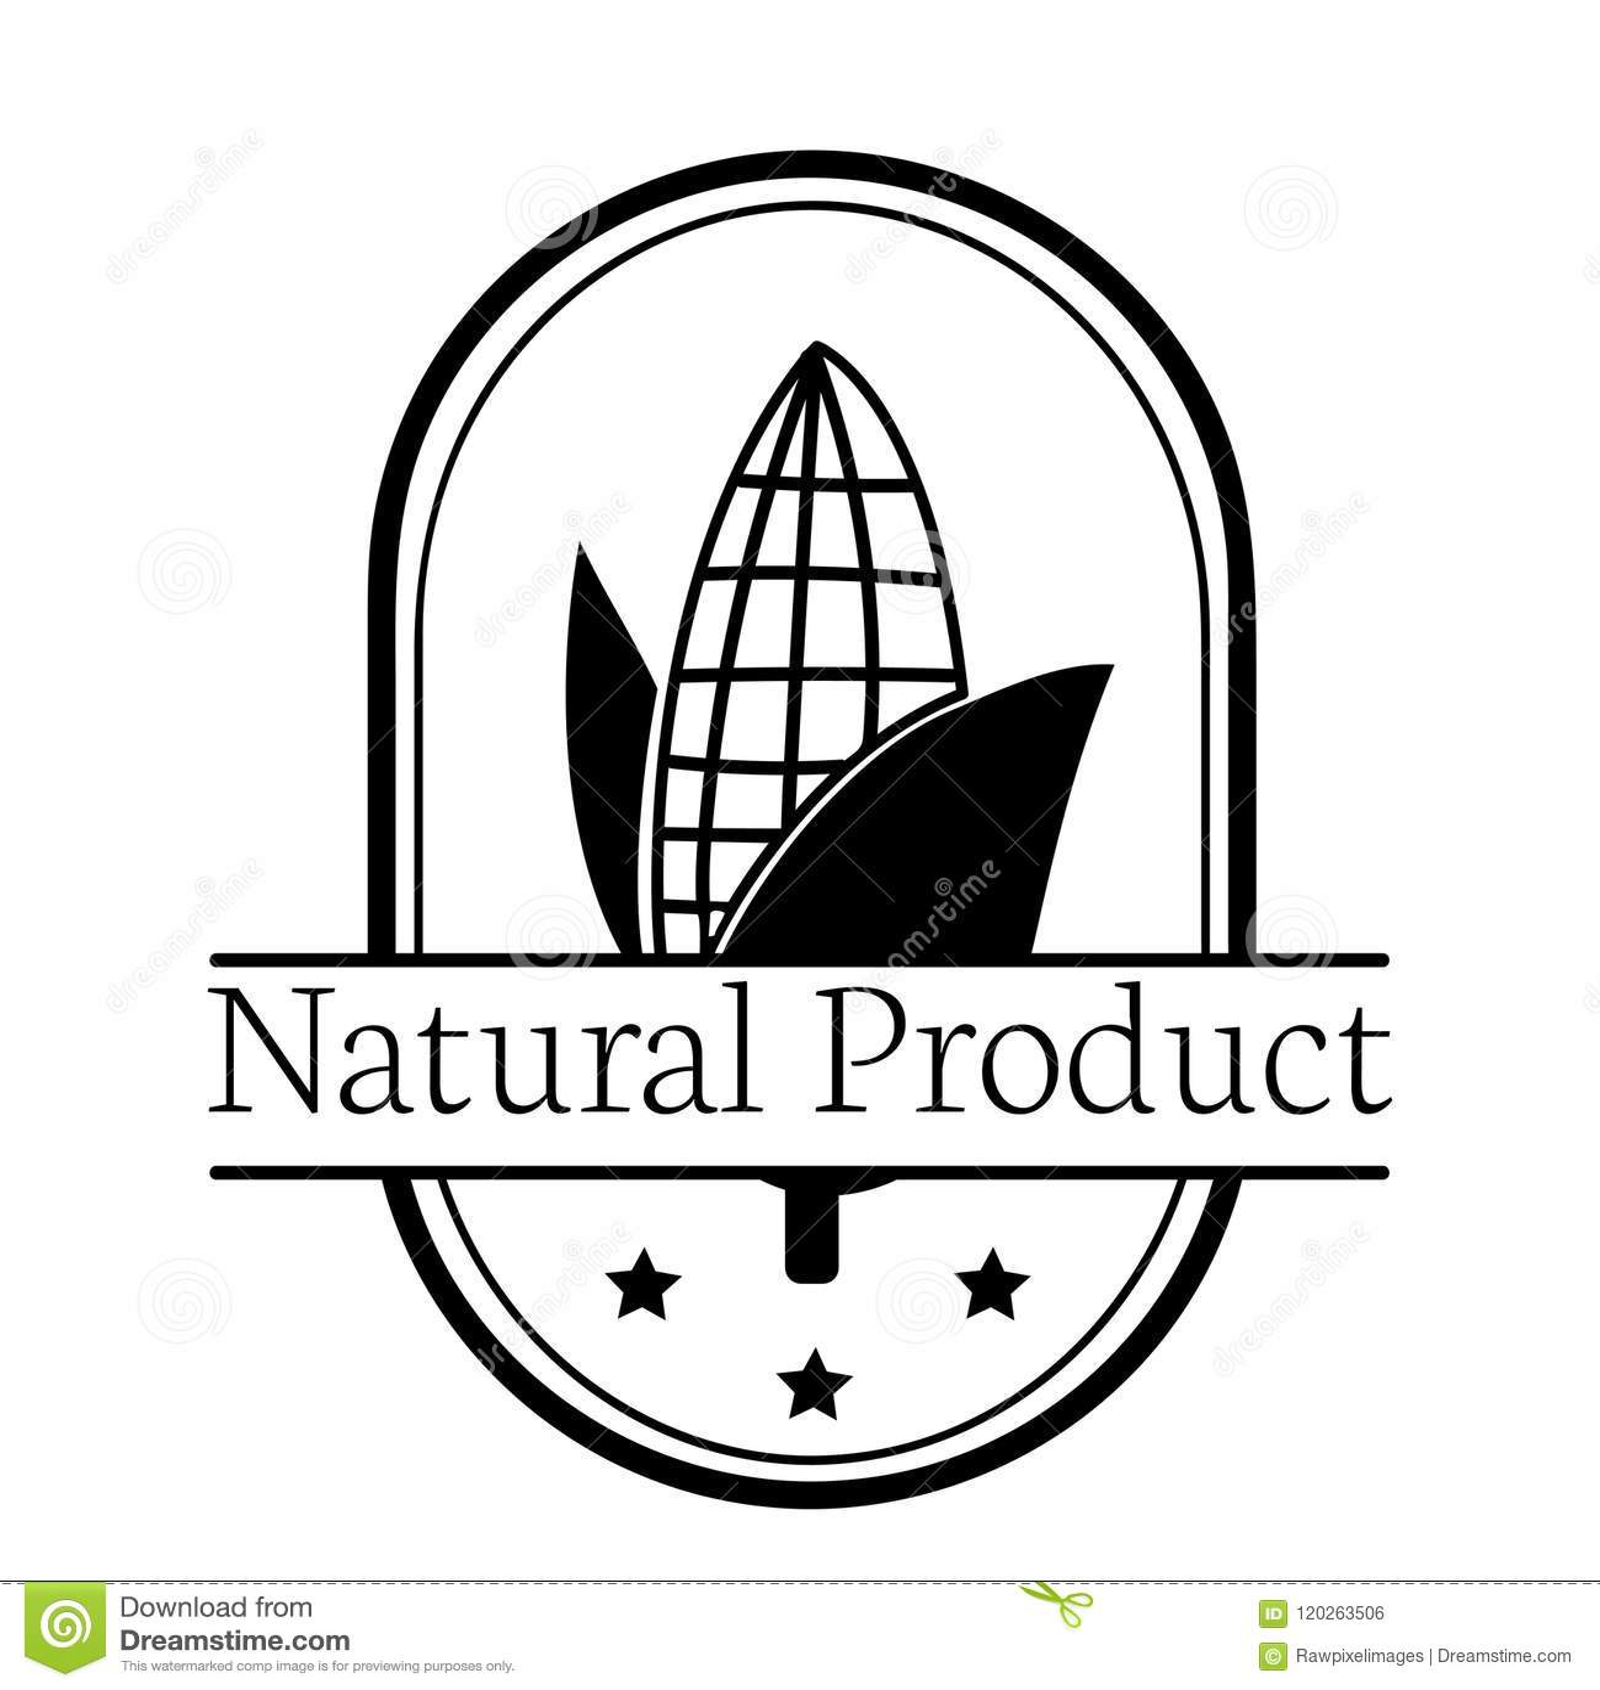 corn natural product logo illustration stock illustration Logos Starting with G corn natural product logo illustration